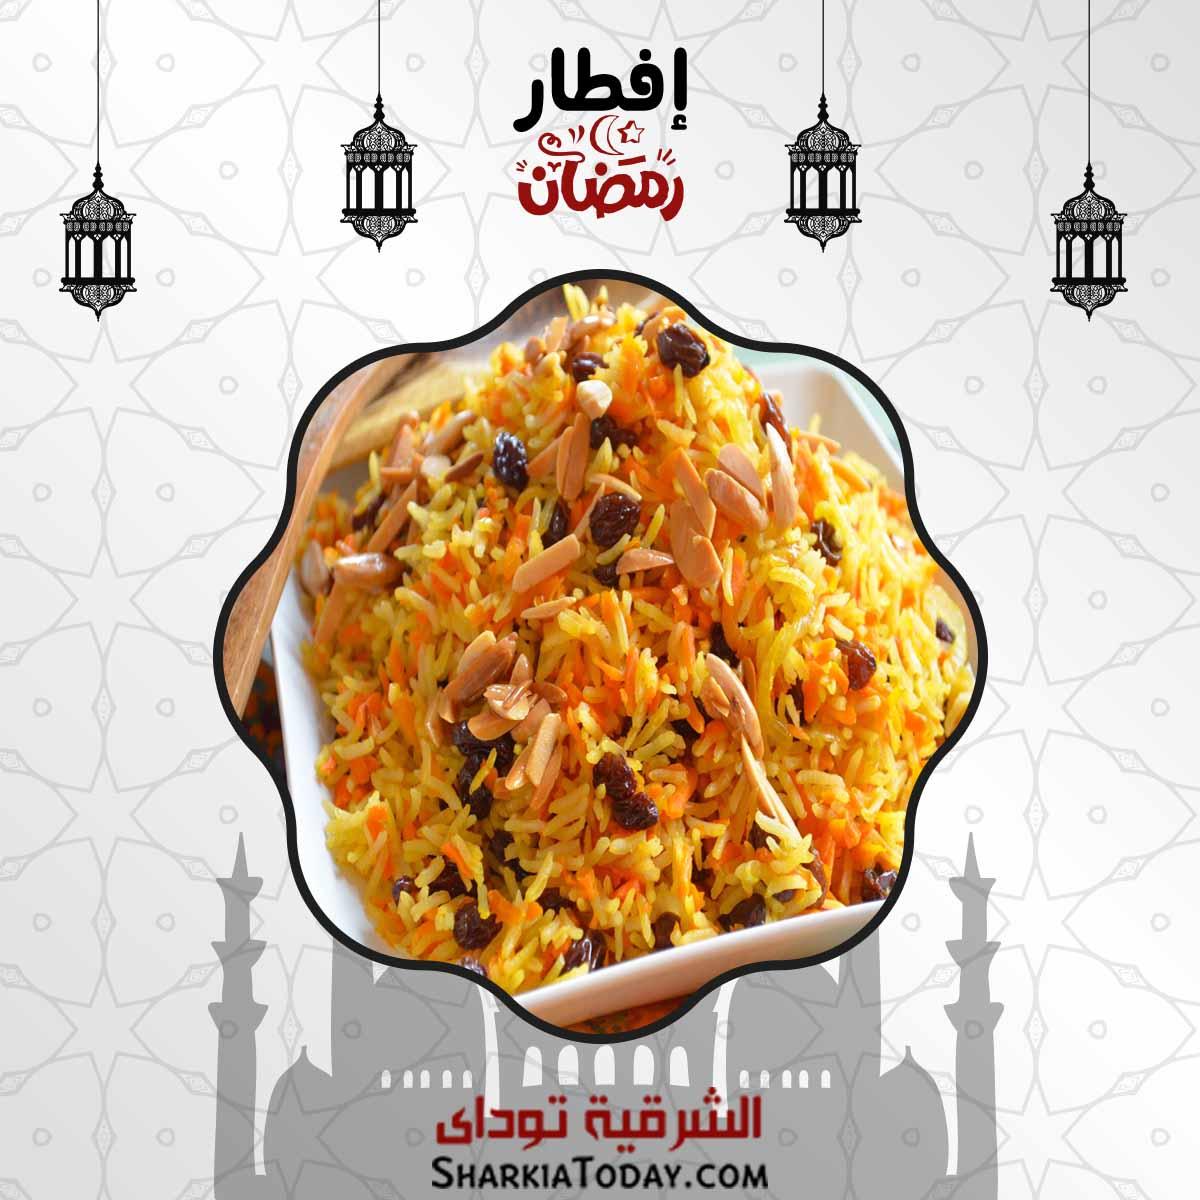 صورة افطار 28 رمضان : فراخ ، بسلة ، أرز بسمتي